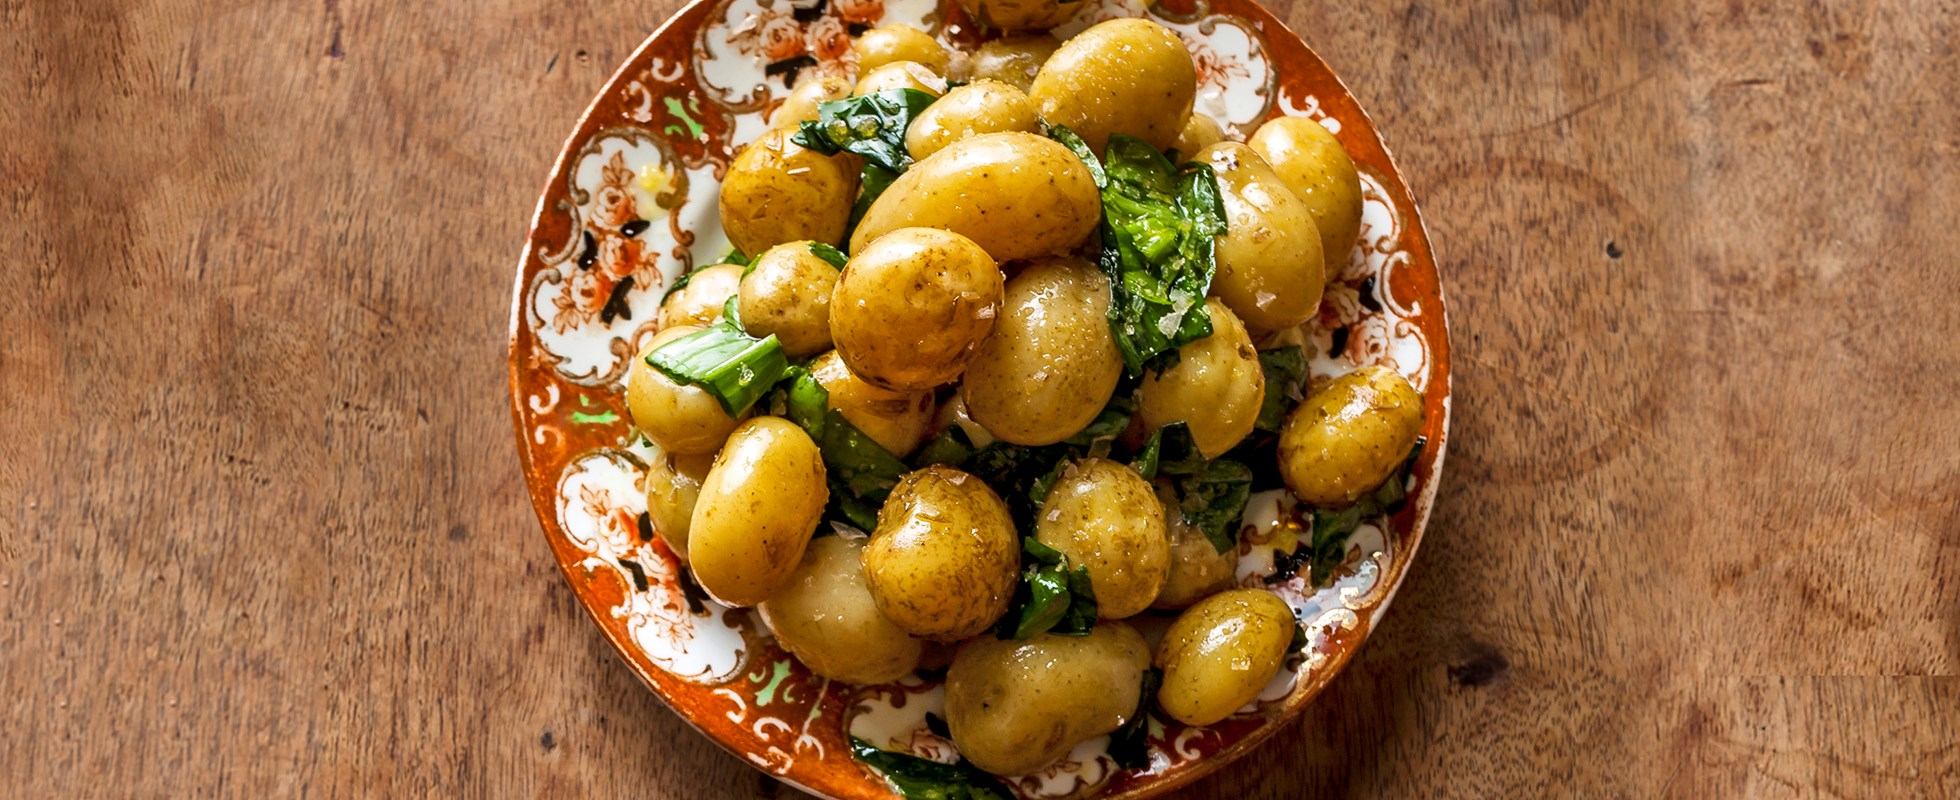 Jersey Royal potatoes with wild garlic